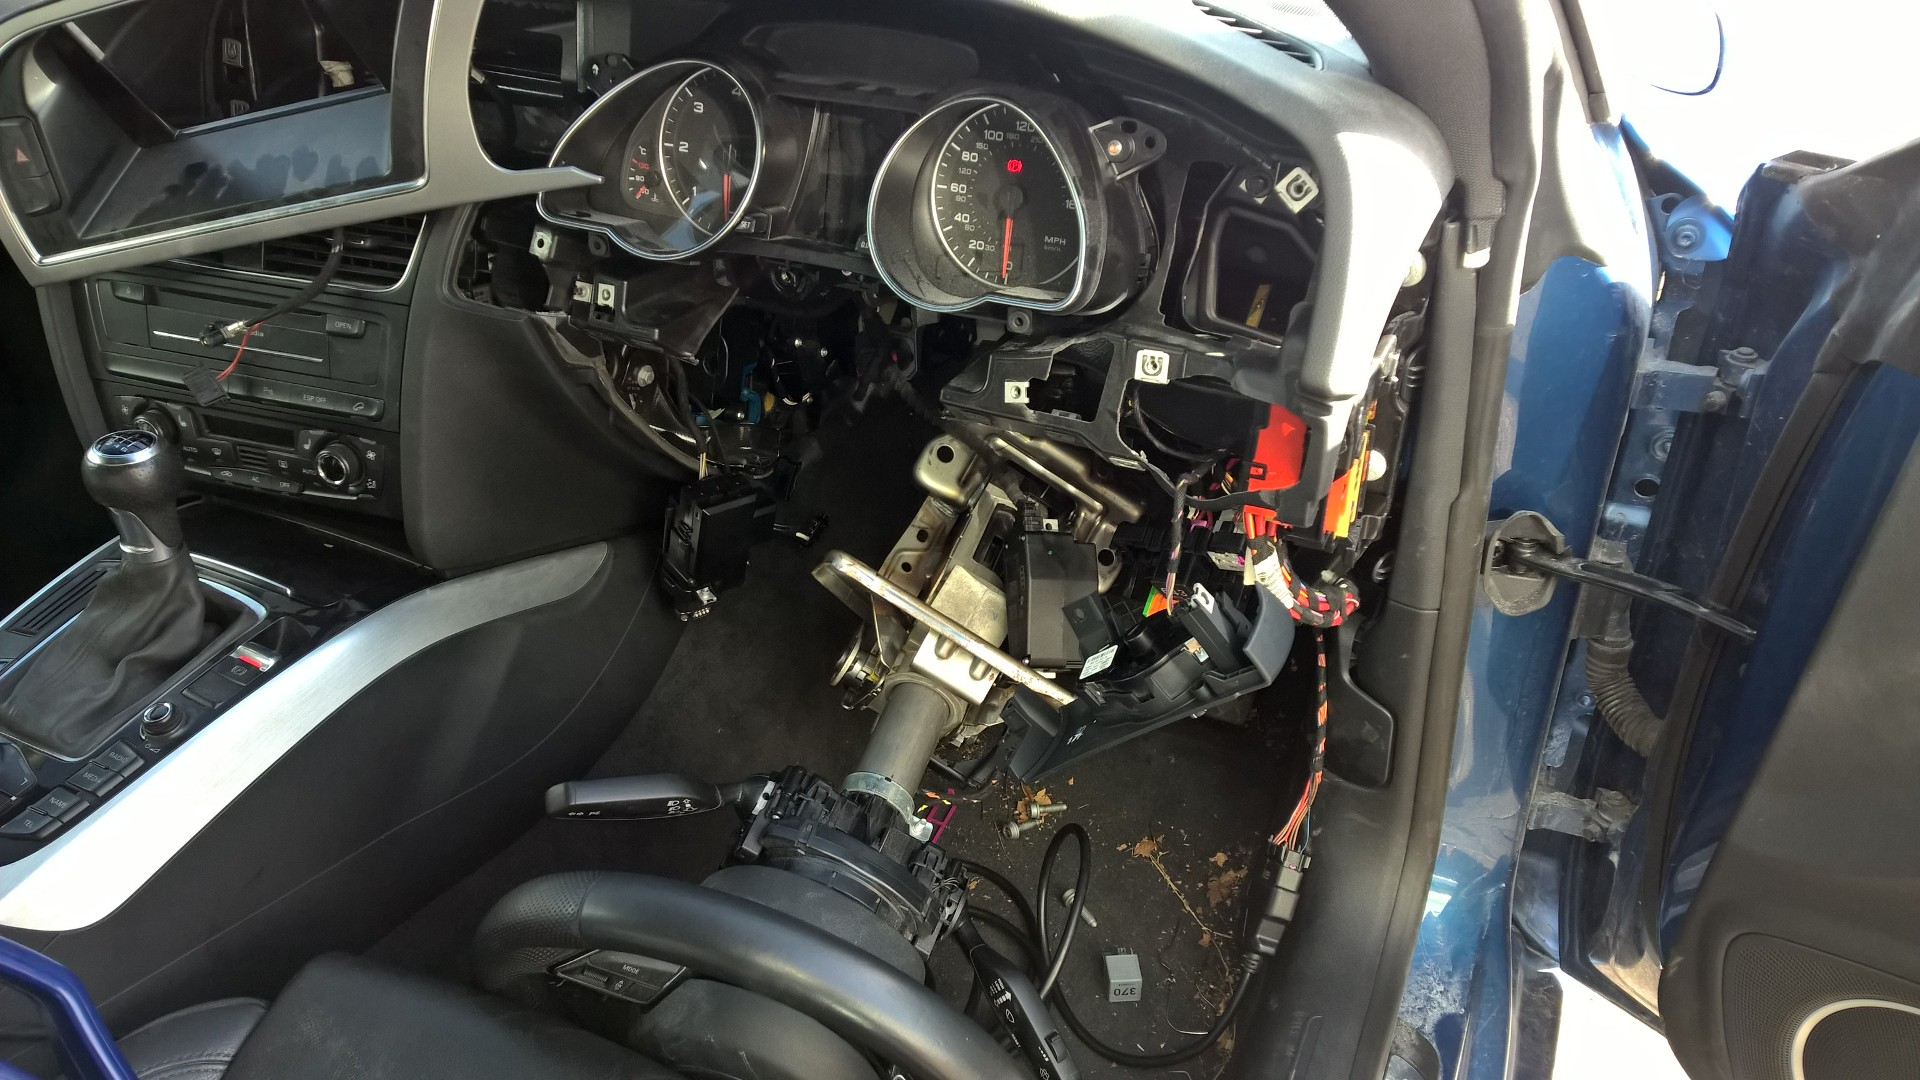 Audi A5 repair part 2 continued…